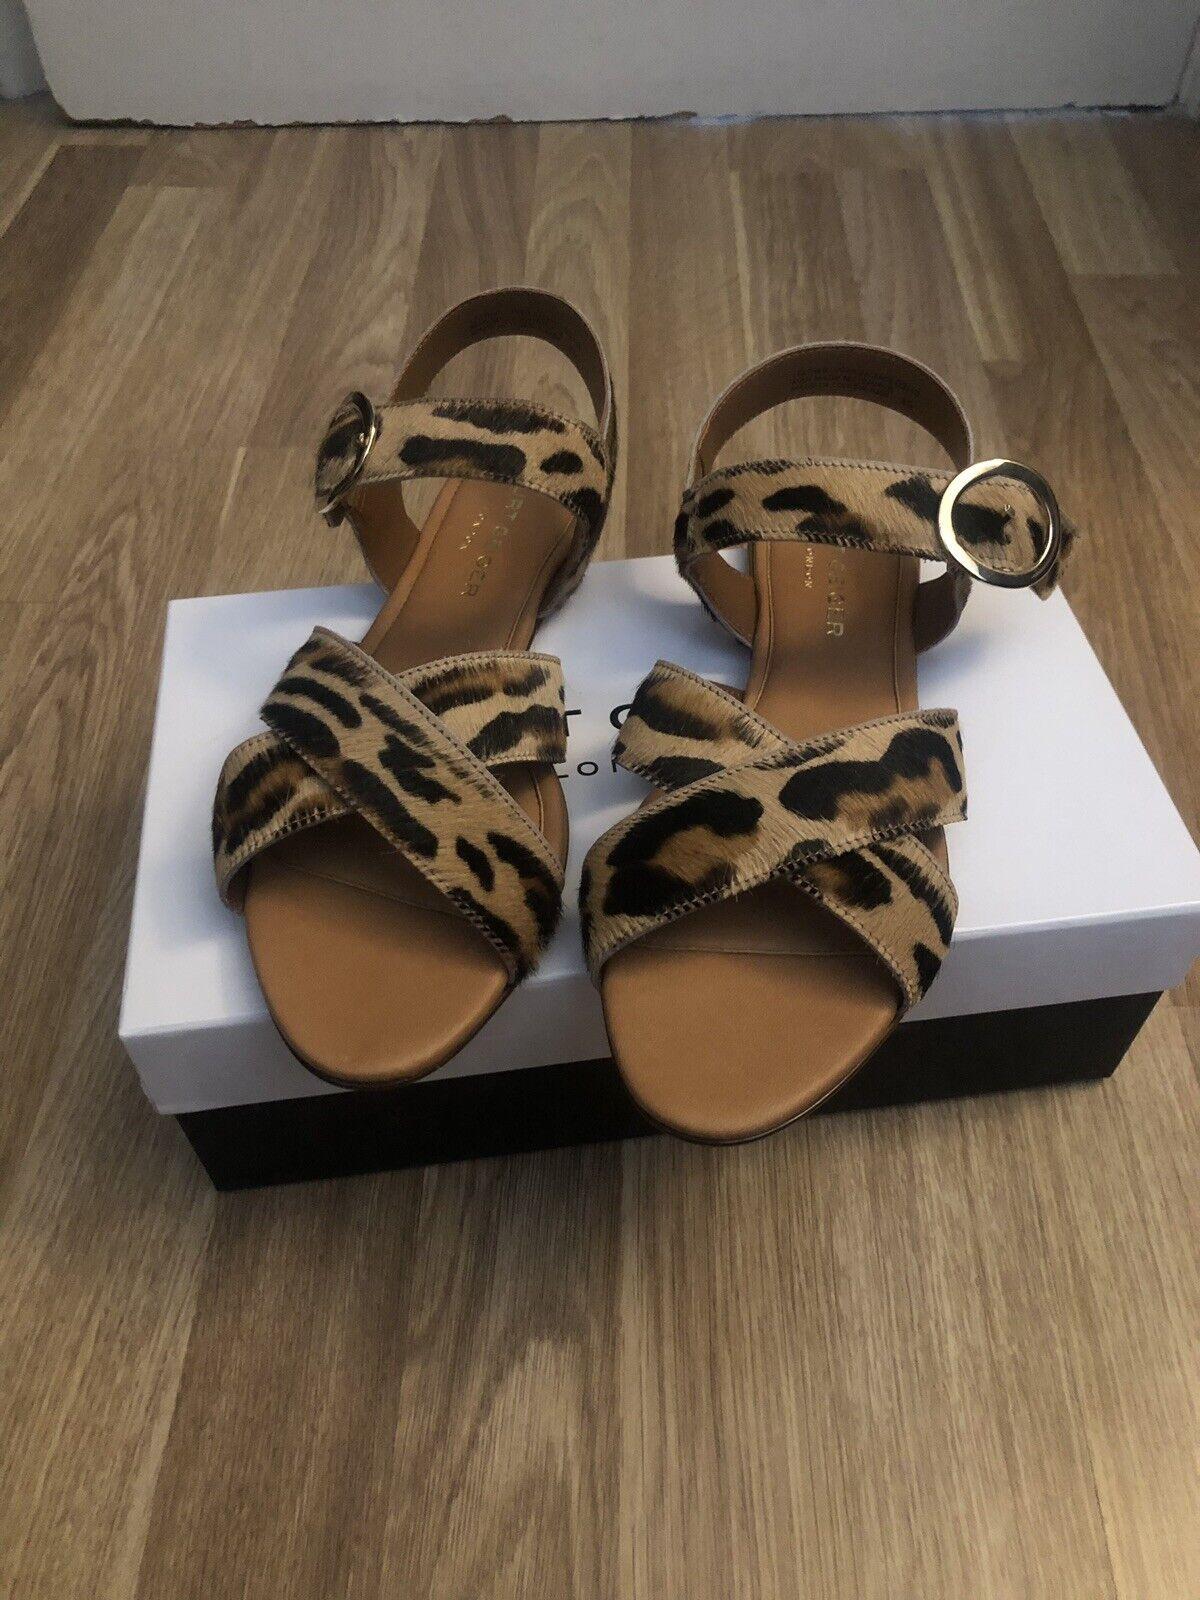 Kurt Kurt Kurt Geiger Tan Sandals Size 6 (brand New) 3f1e23